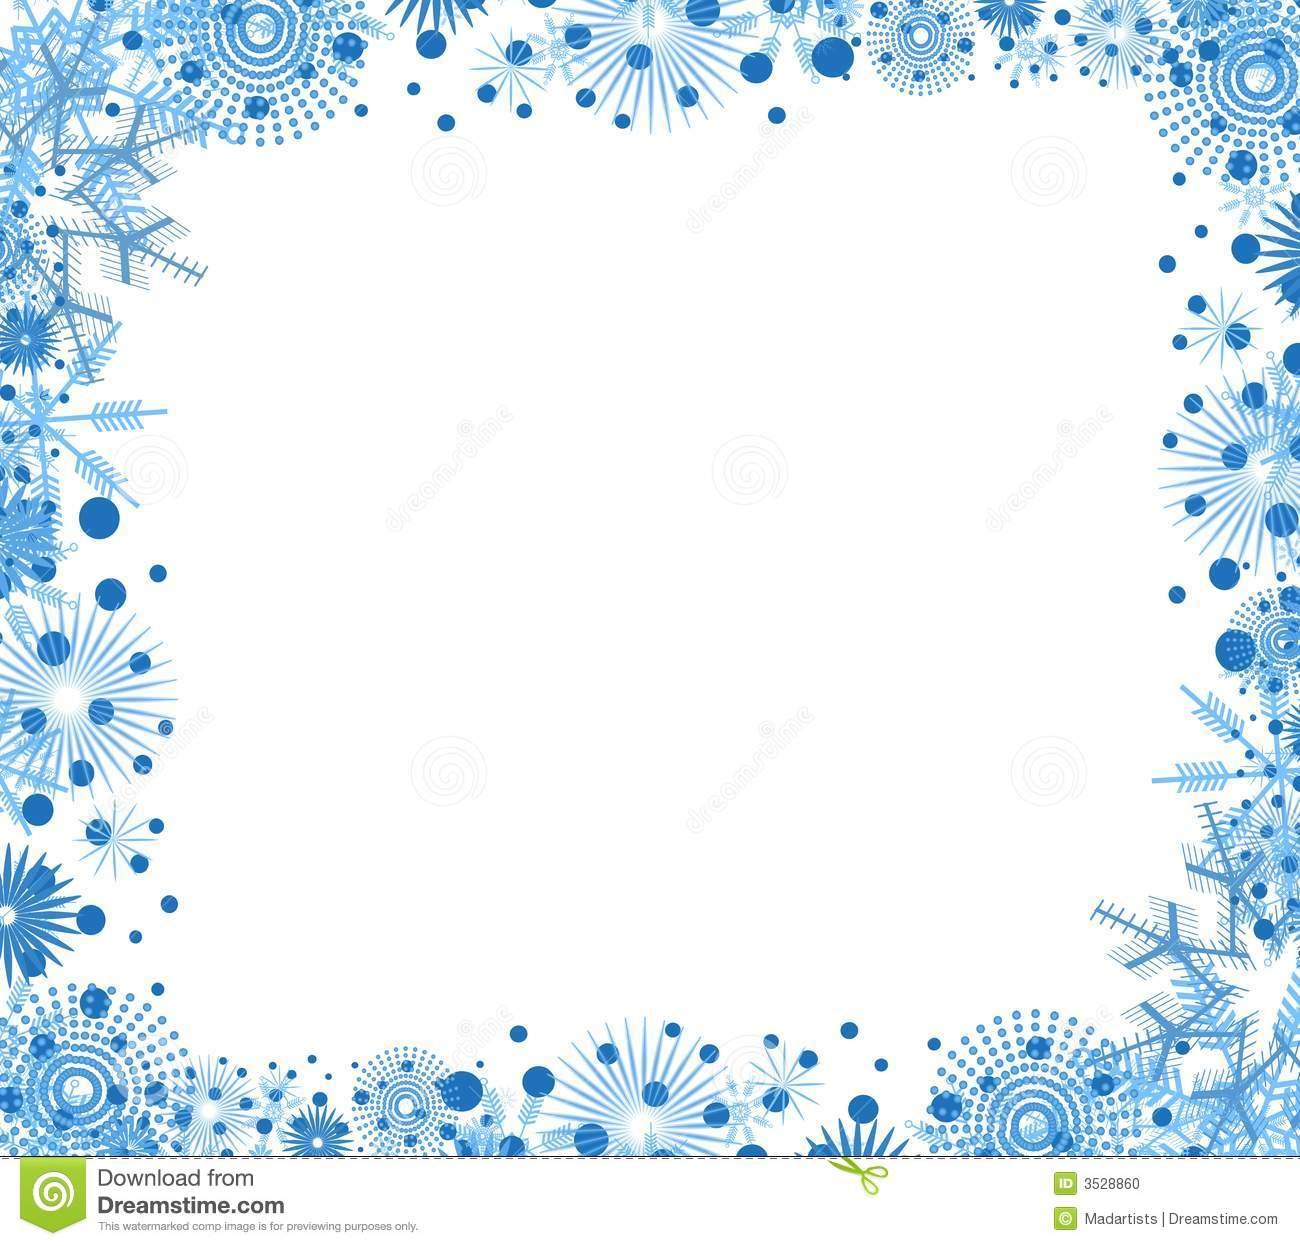 Clip Art Background Border Featuring Dec-Clip Art Background Border Featuring Decorative Blue Snowflakes-0